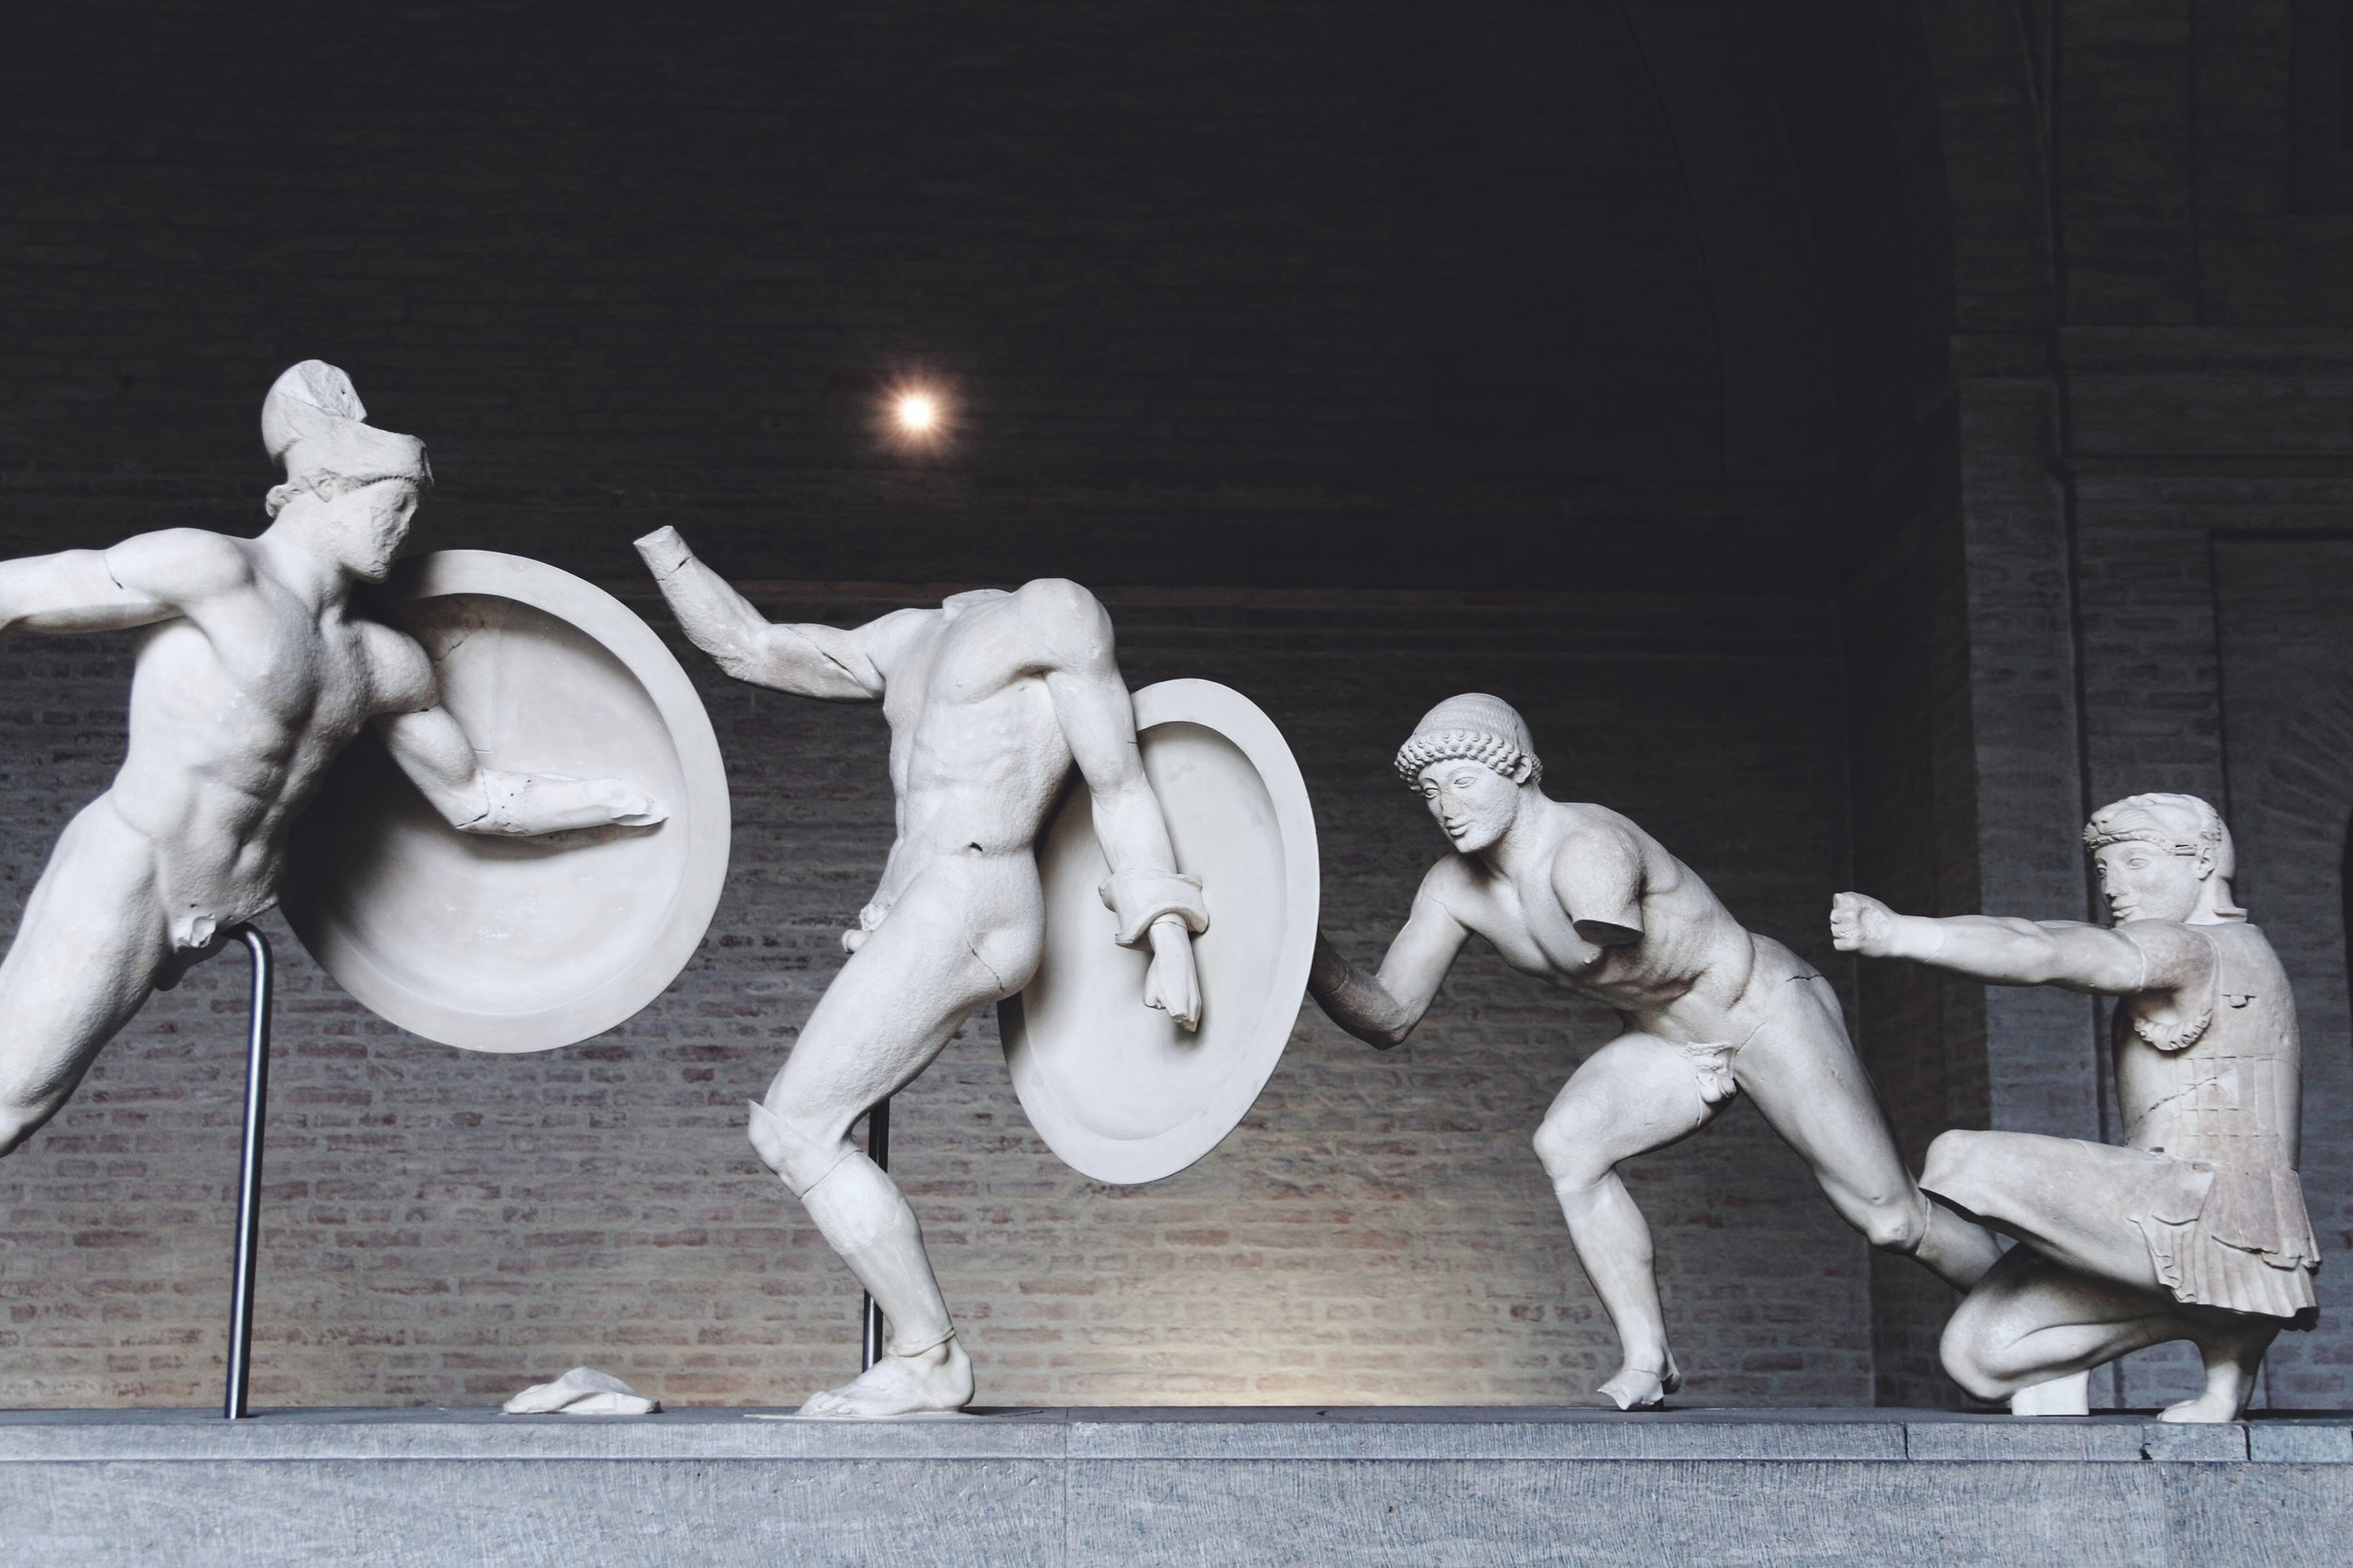 Antique sculptures at Glyptothek